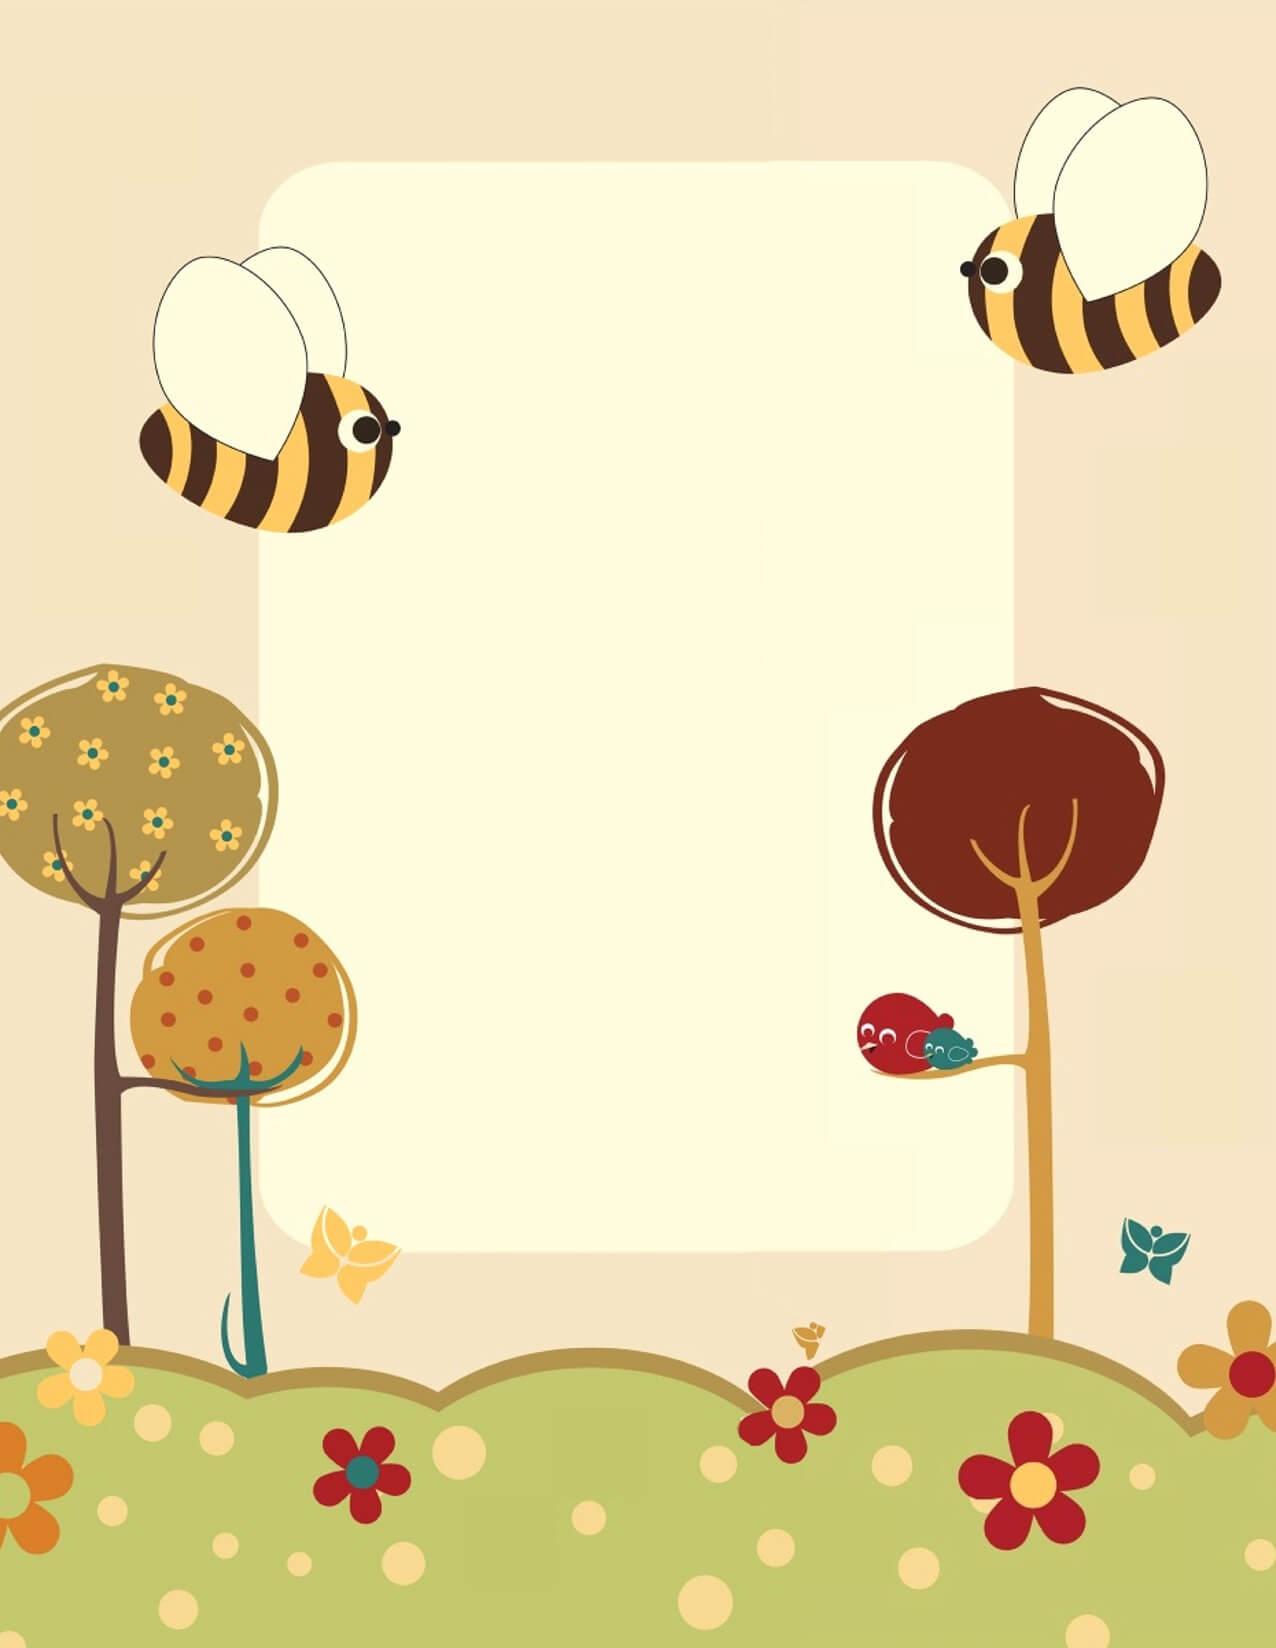 Spelling Award Certificate Maker Regarding Spelling Bee Award Certificate Template